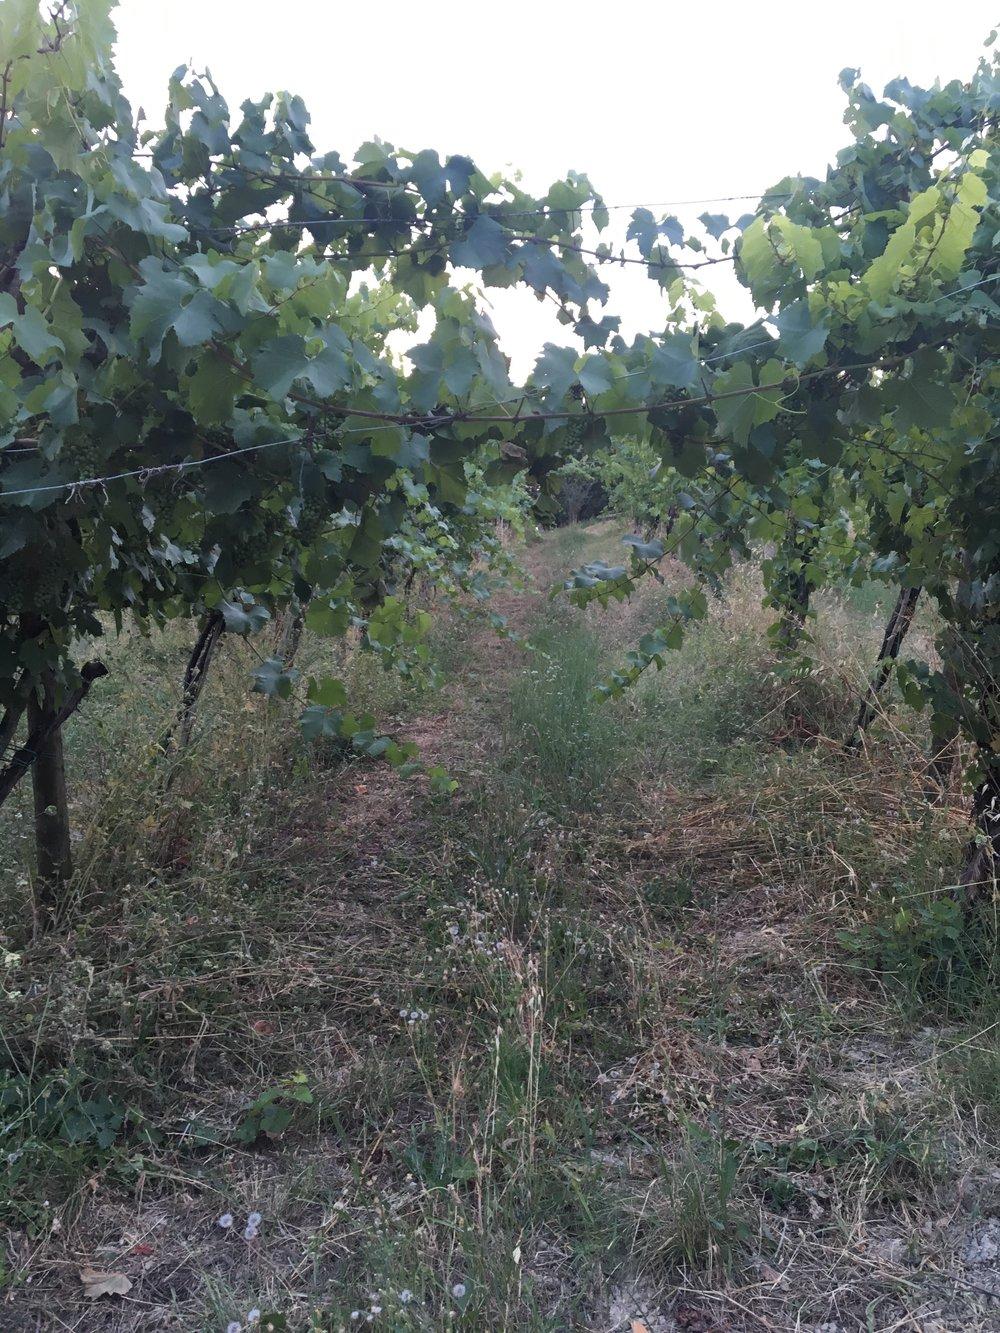 Gradizzolo wijngaard.jpg